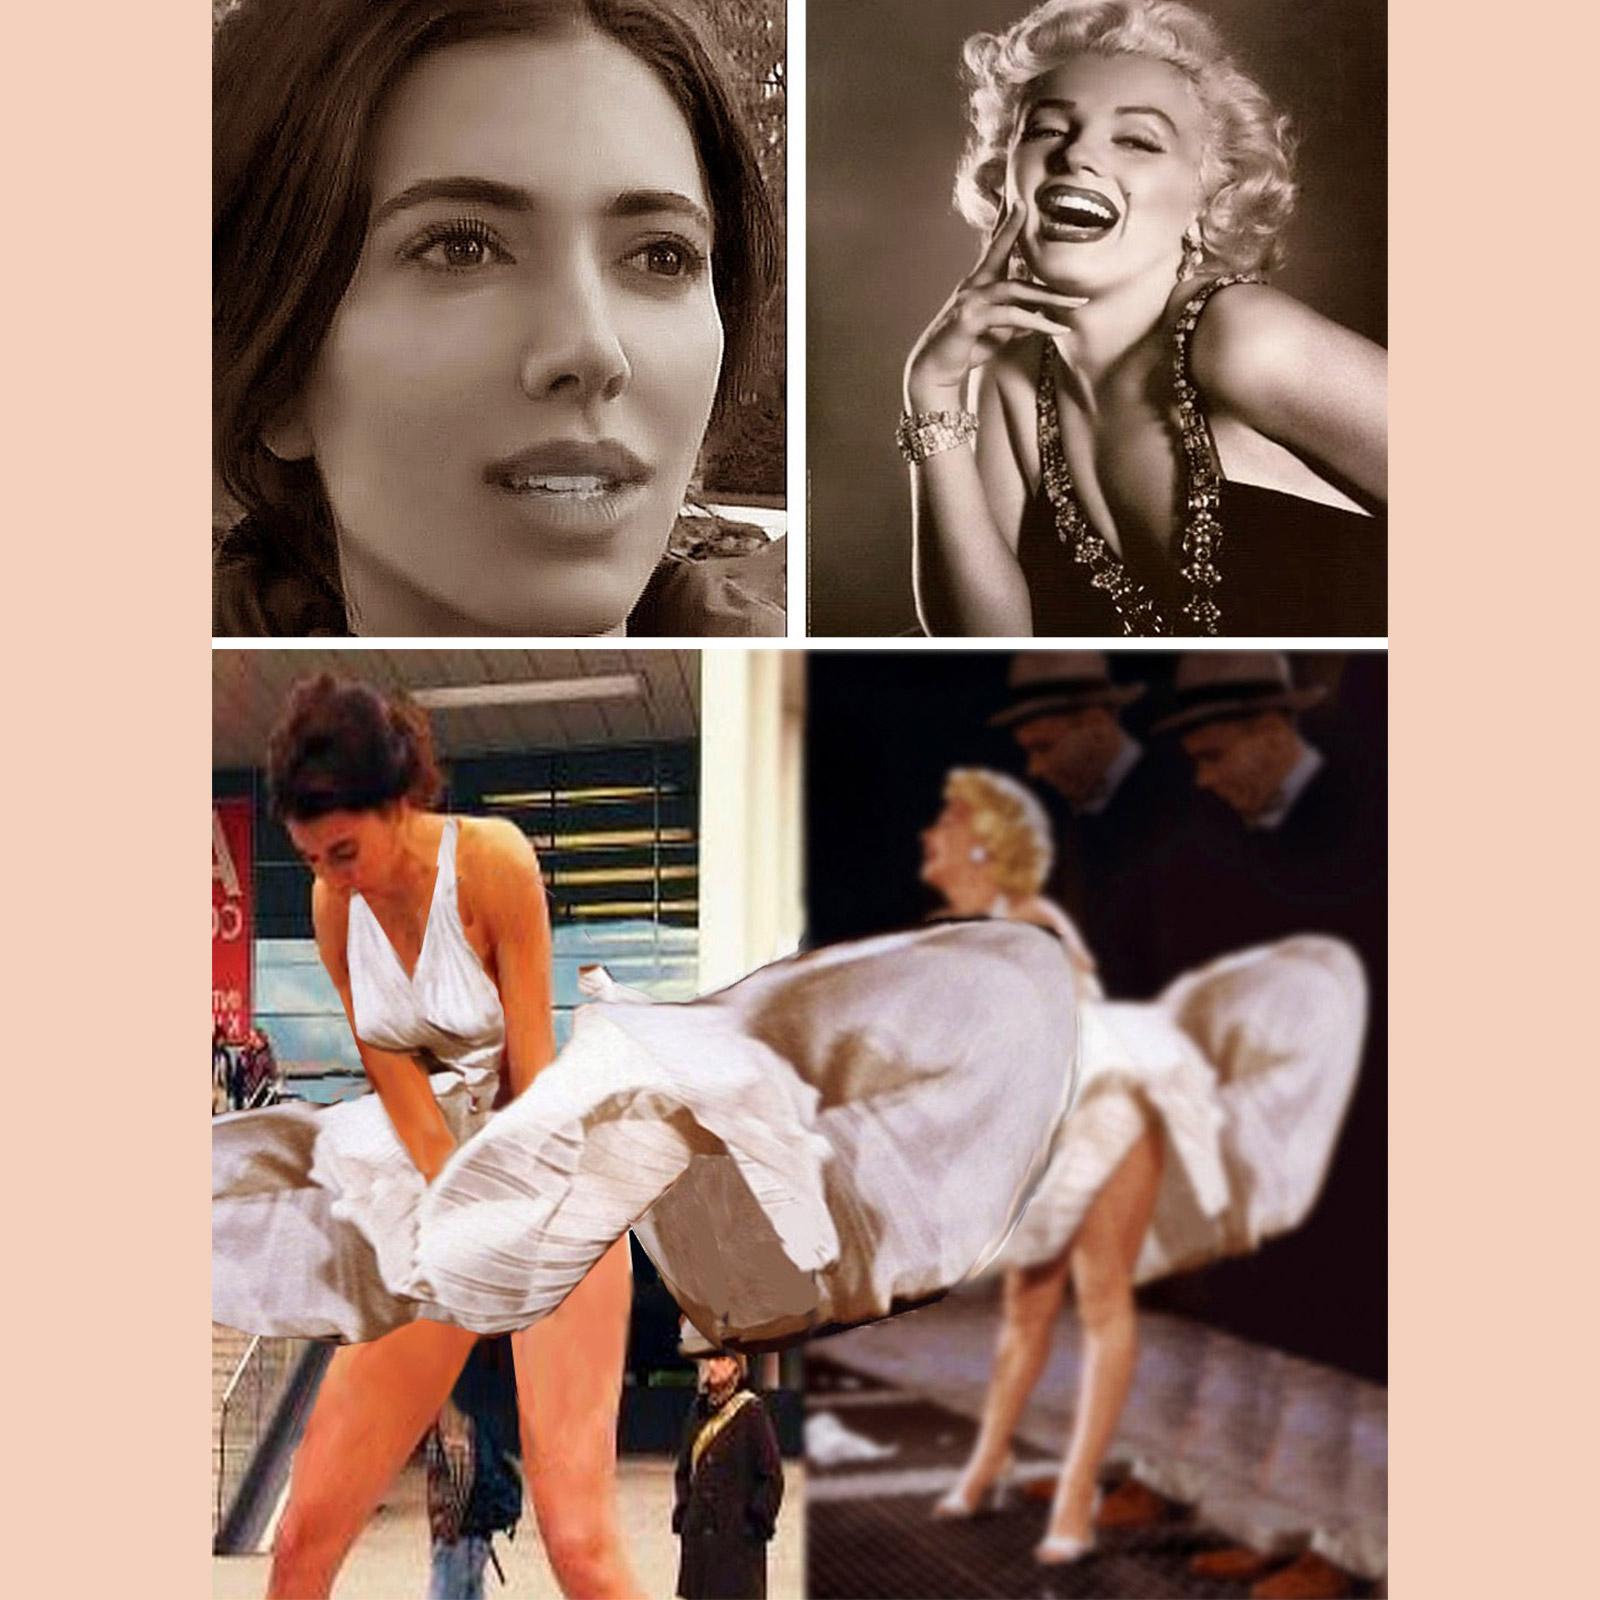 MM Marilyn